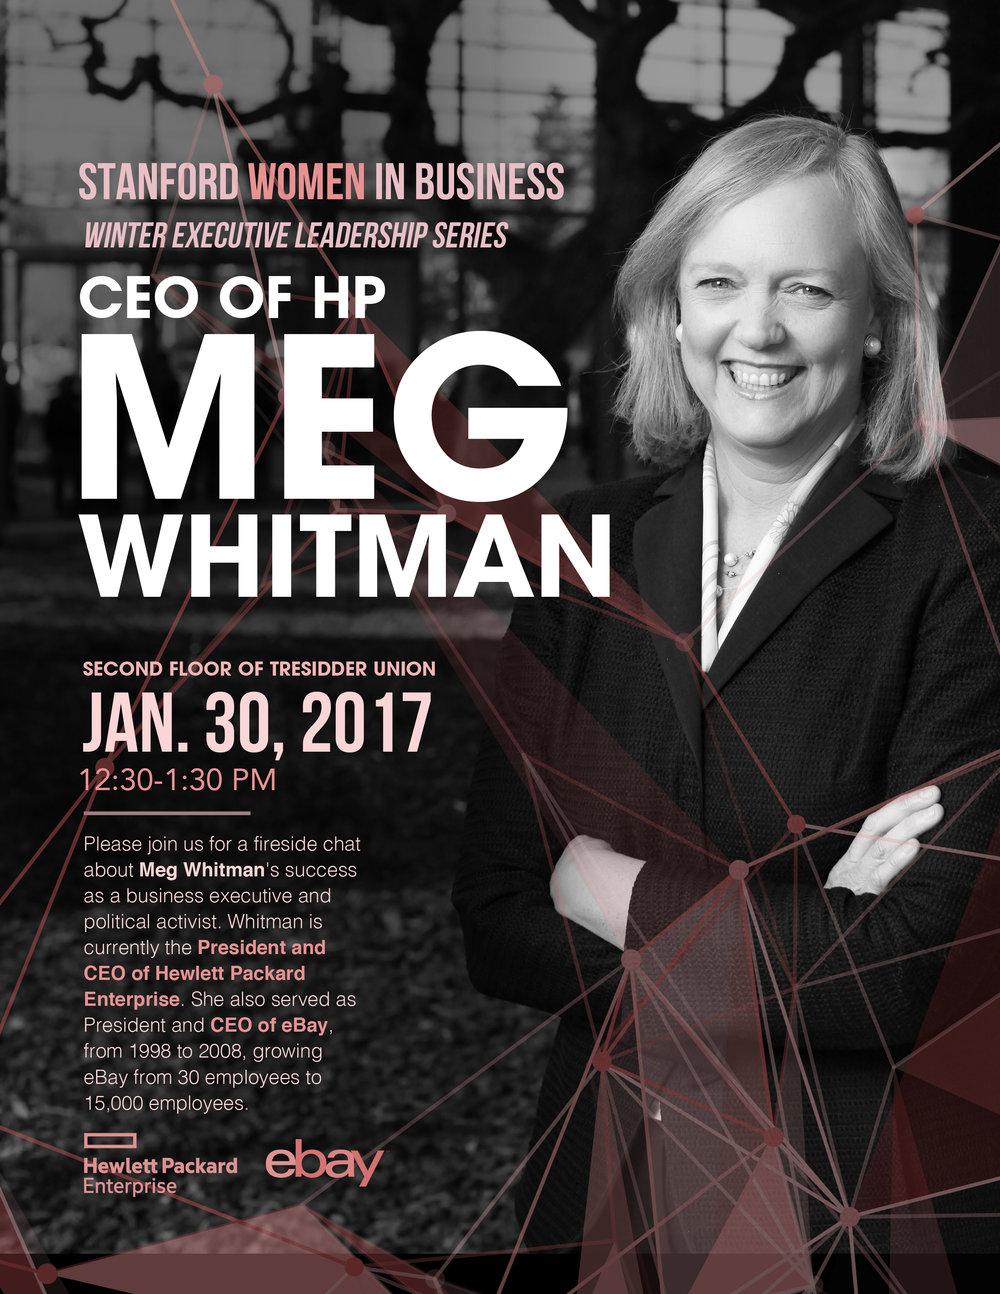 meg whitman transactional leadership